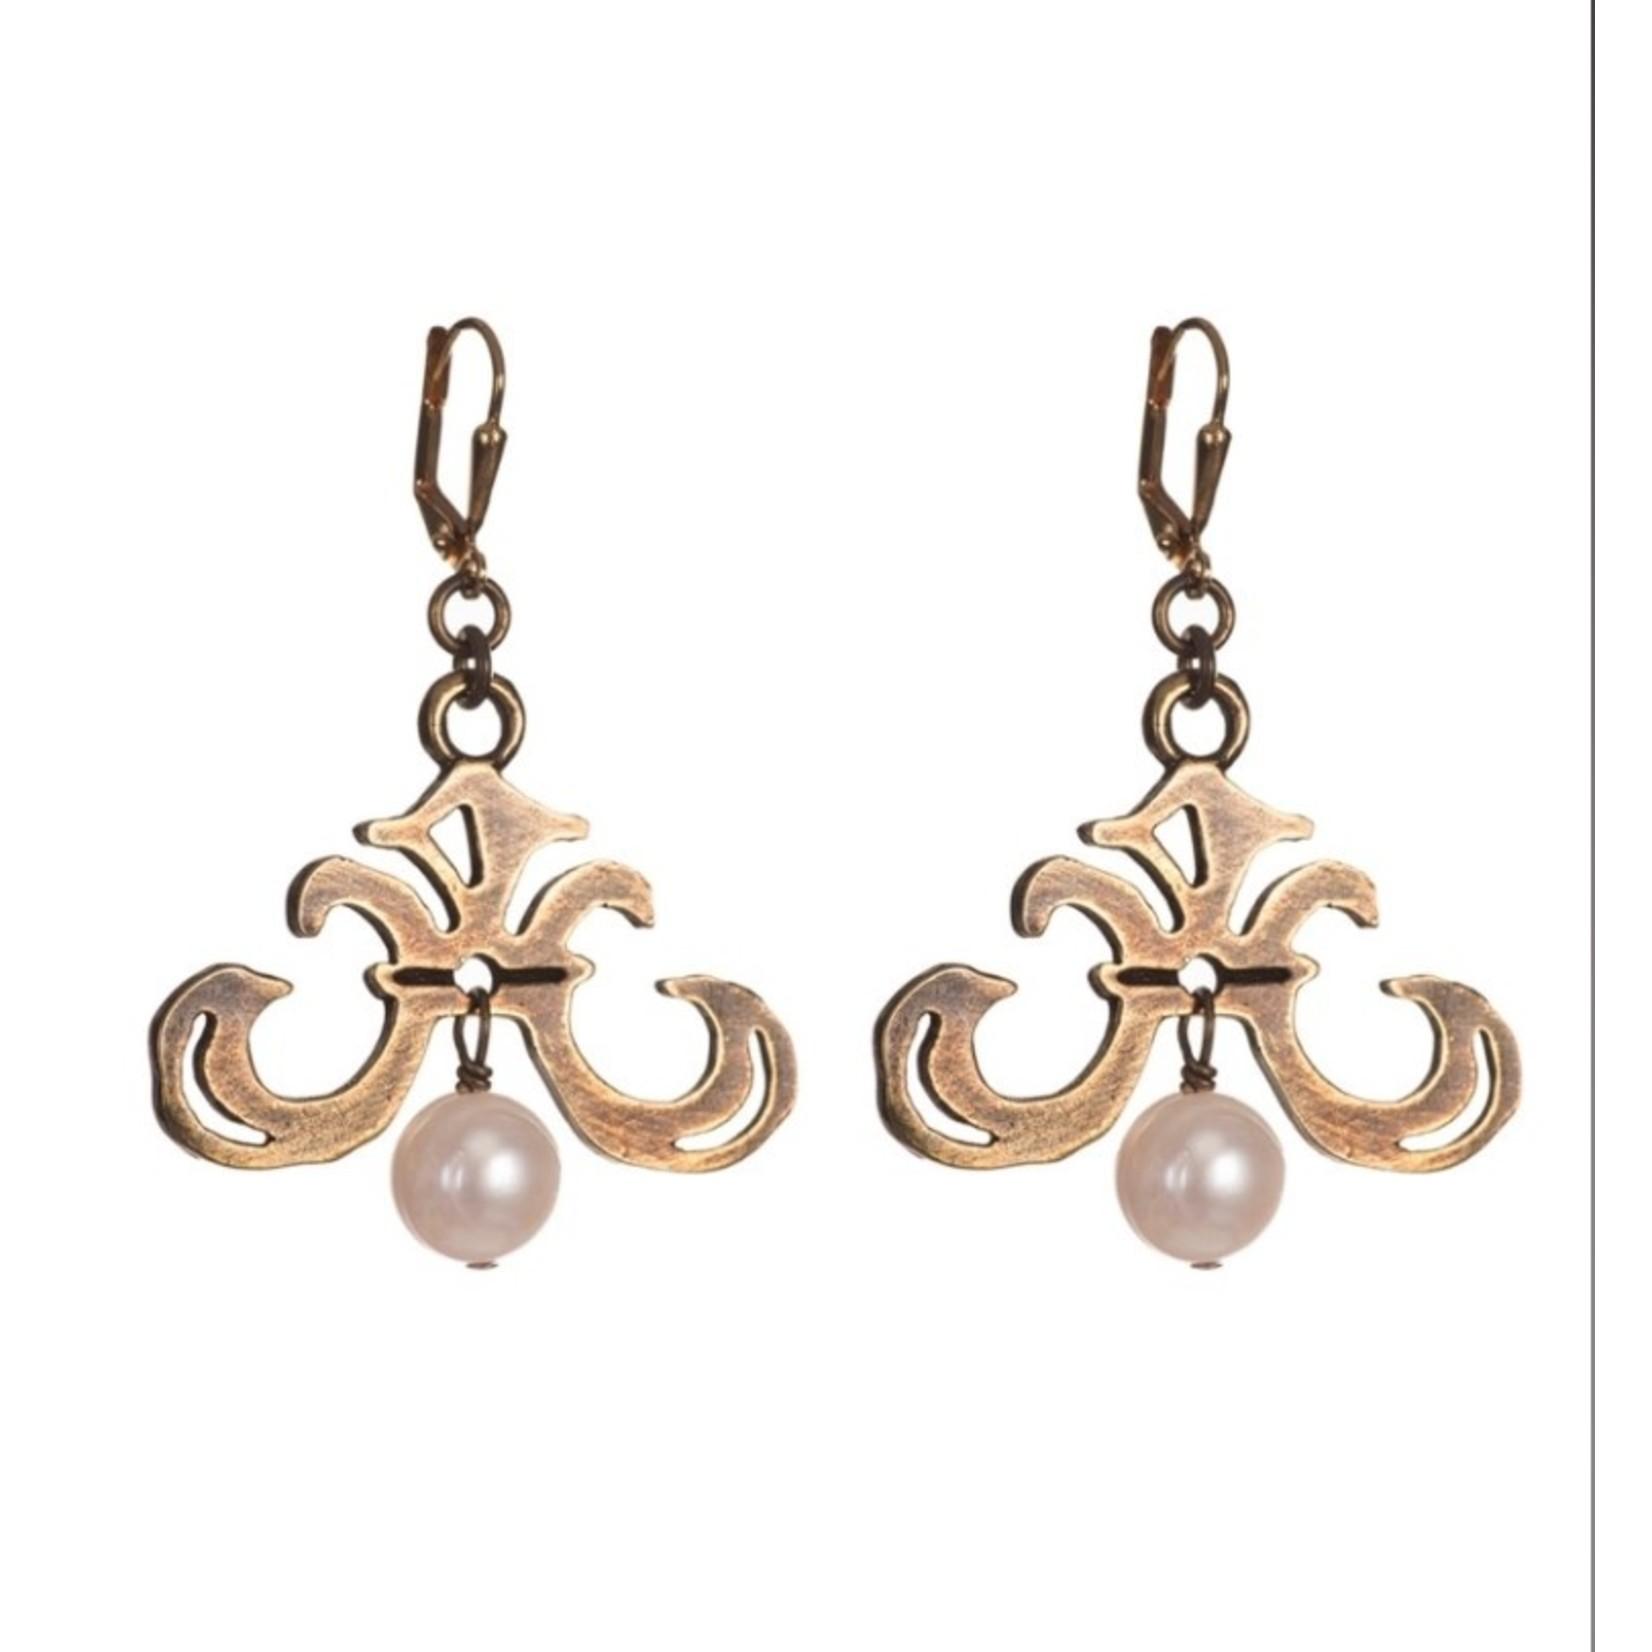 French Kande Grand Fleur Pearl Earrings